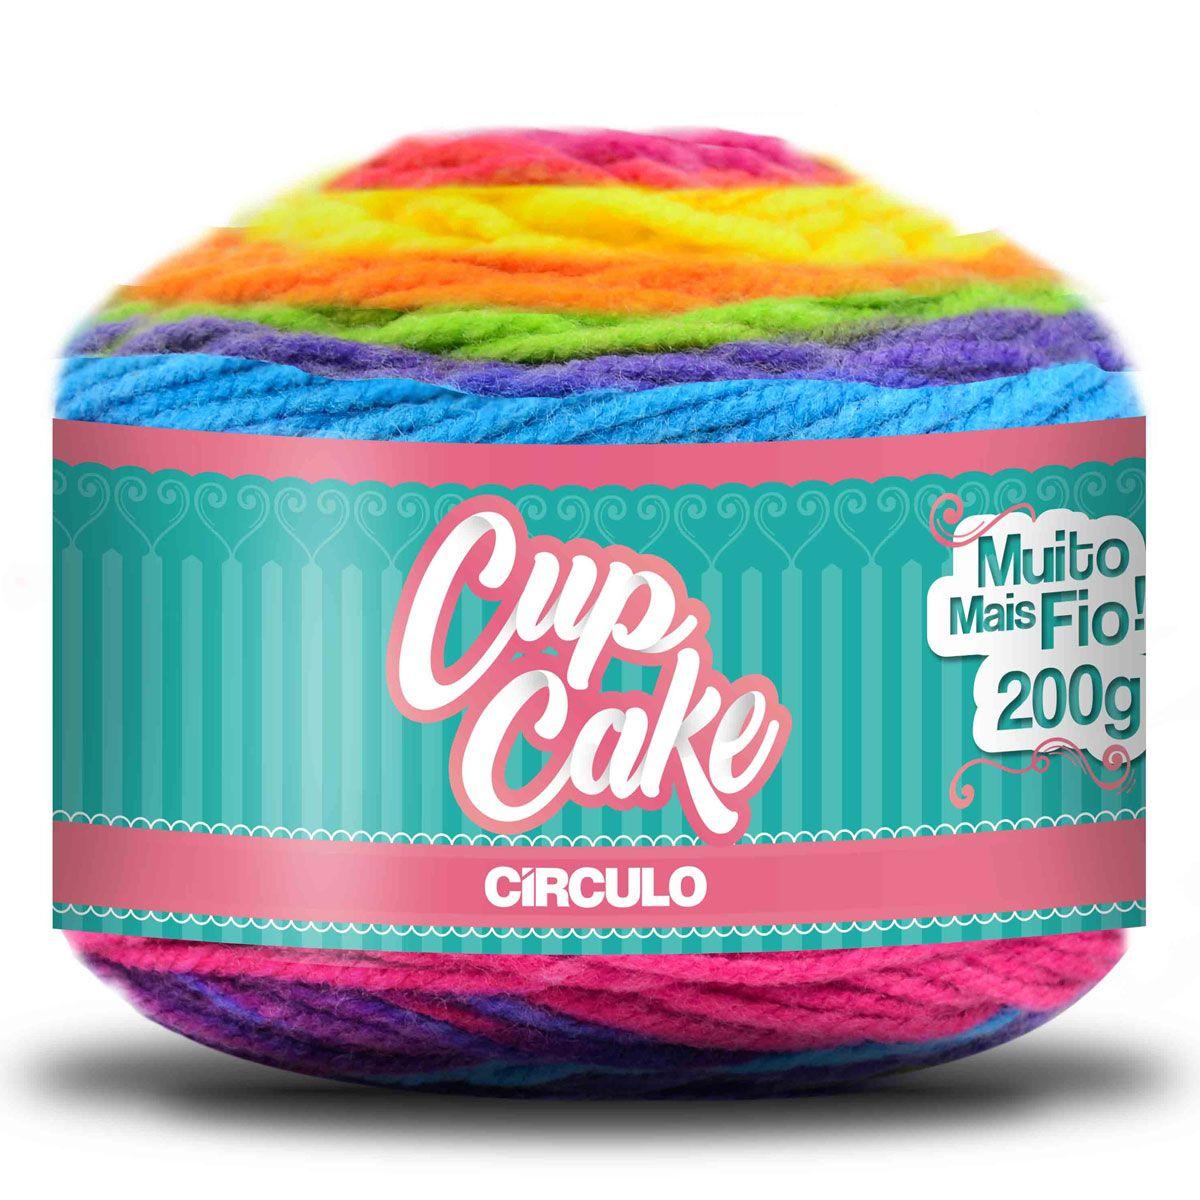 Fio Cup Cake Círculo S/A 200g